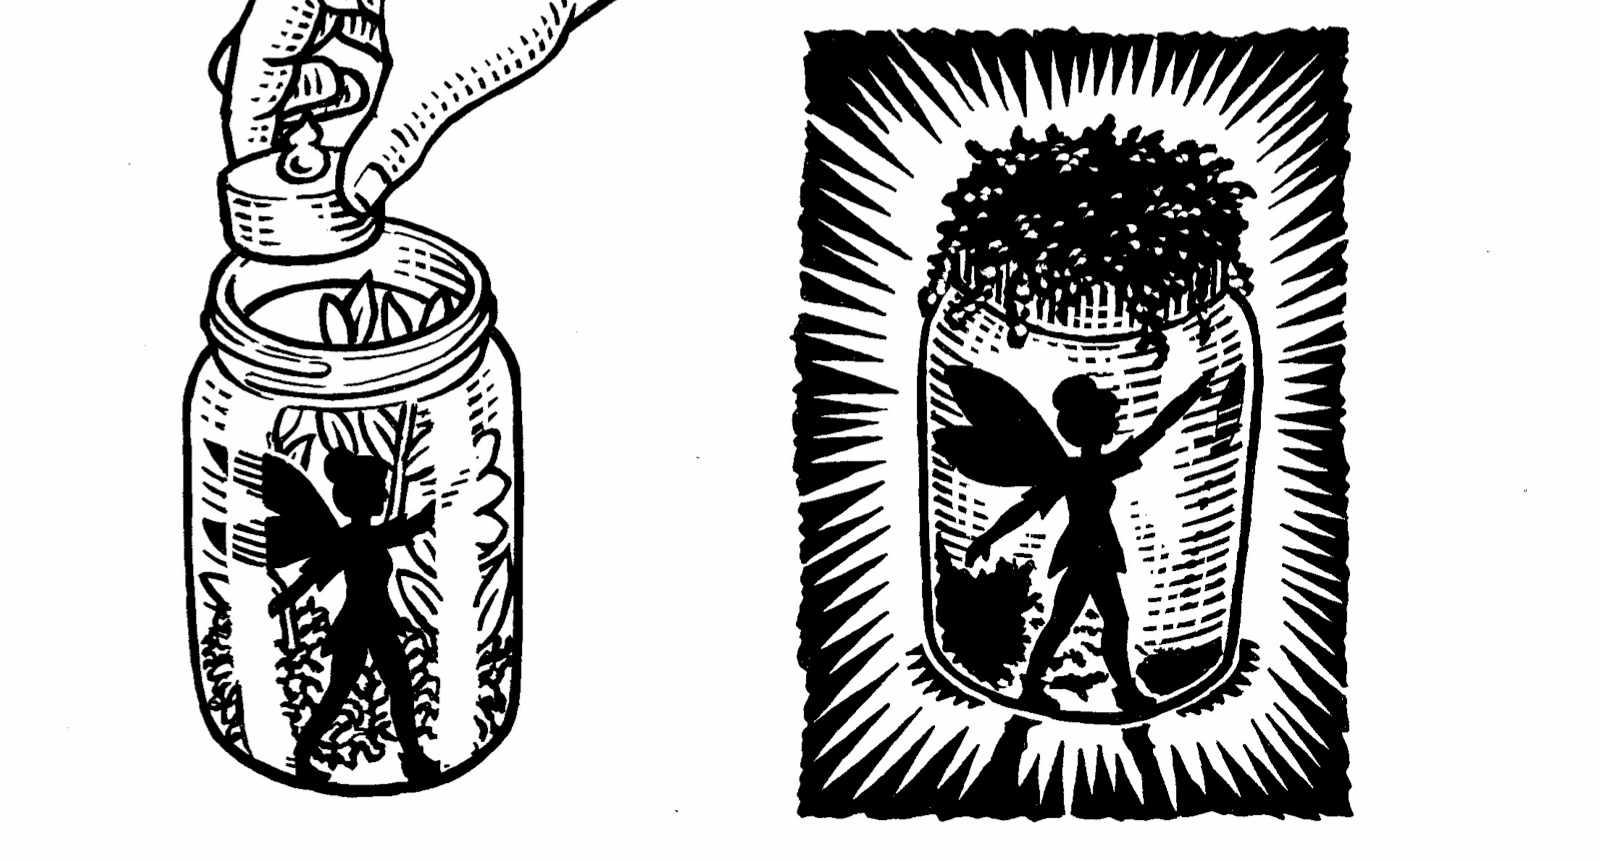 7-BBC-Countryfile-Autumn-Fairy-Jar-artwork-aaab8b0